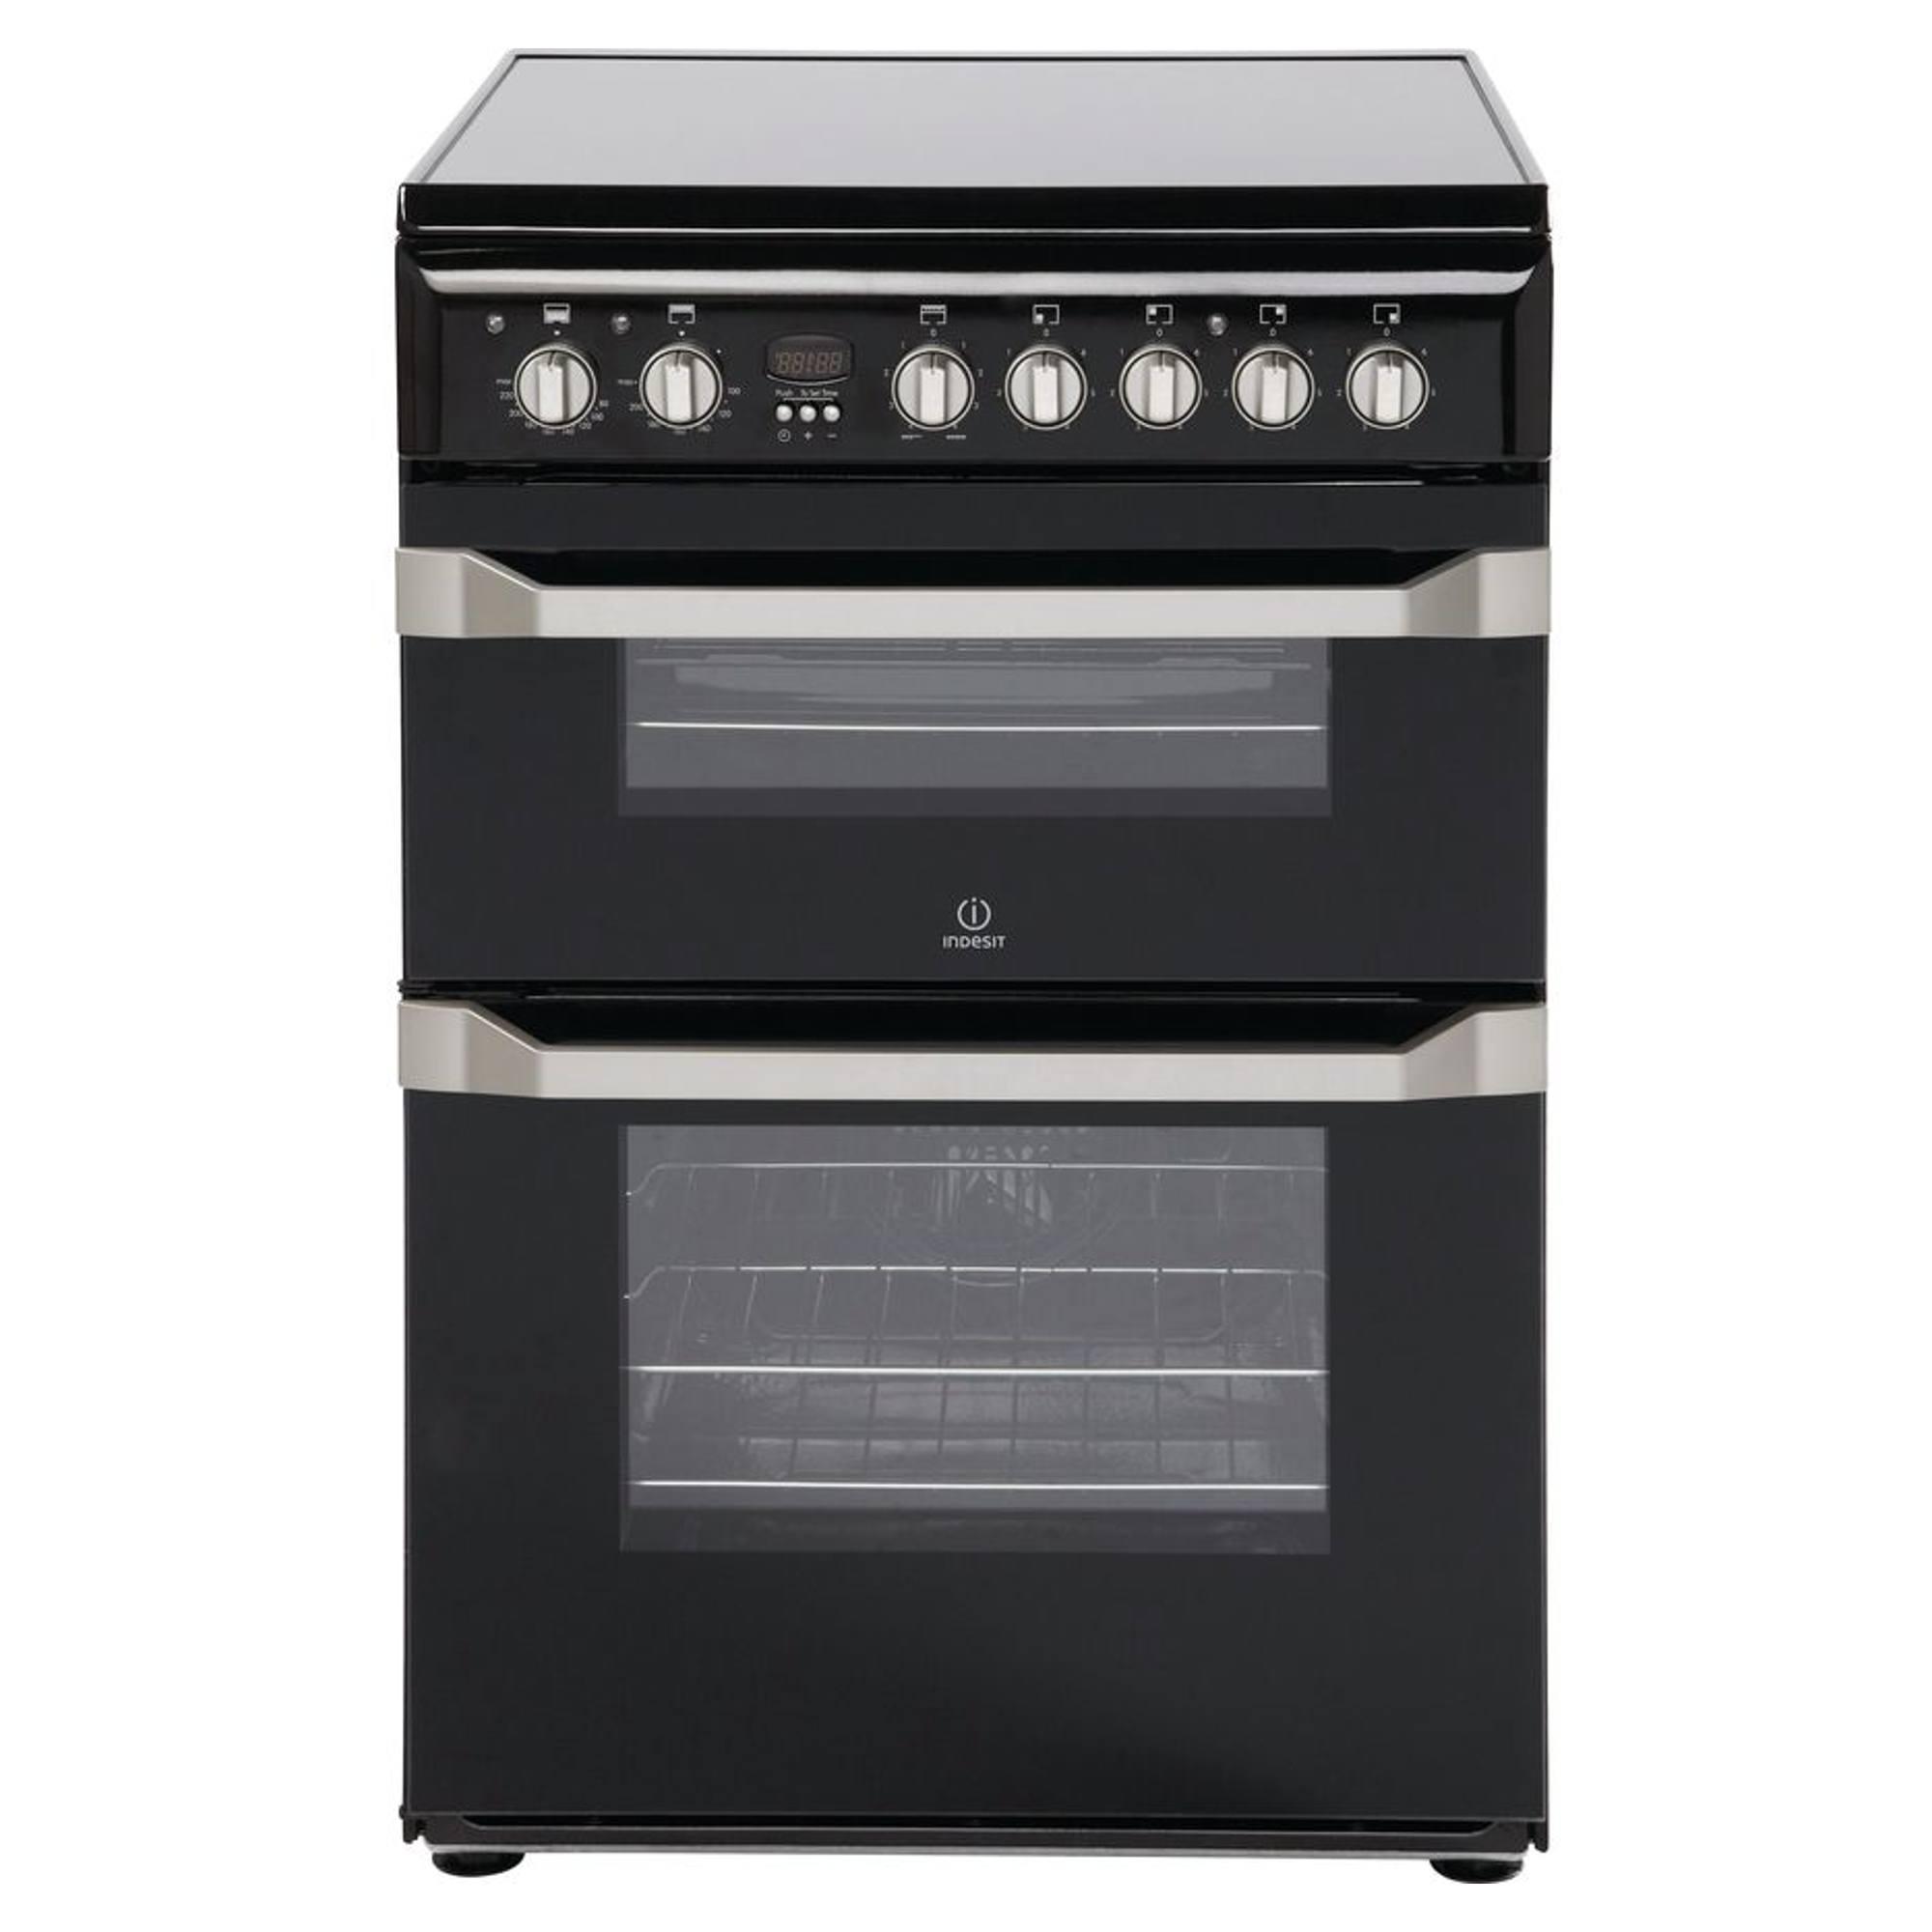 Indesit Id60c2ks Electric Cooker With Ceramic Hob Hughes